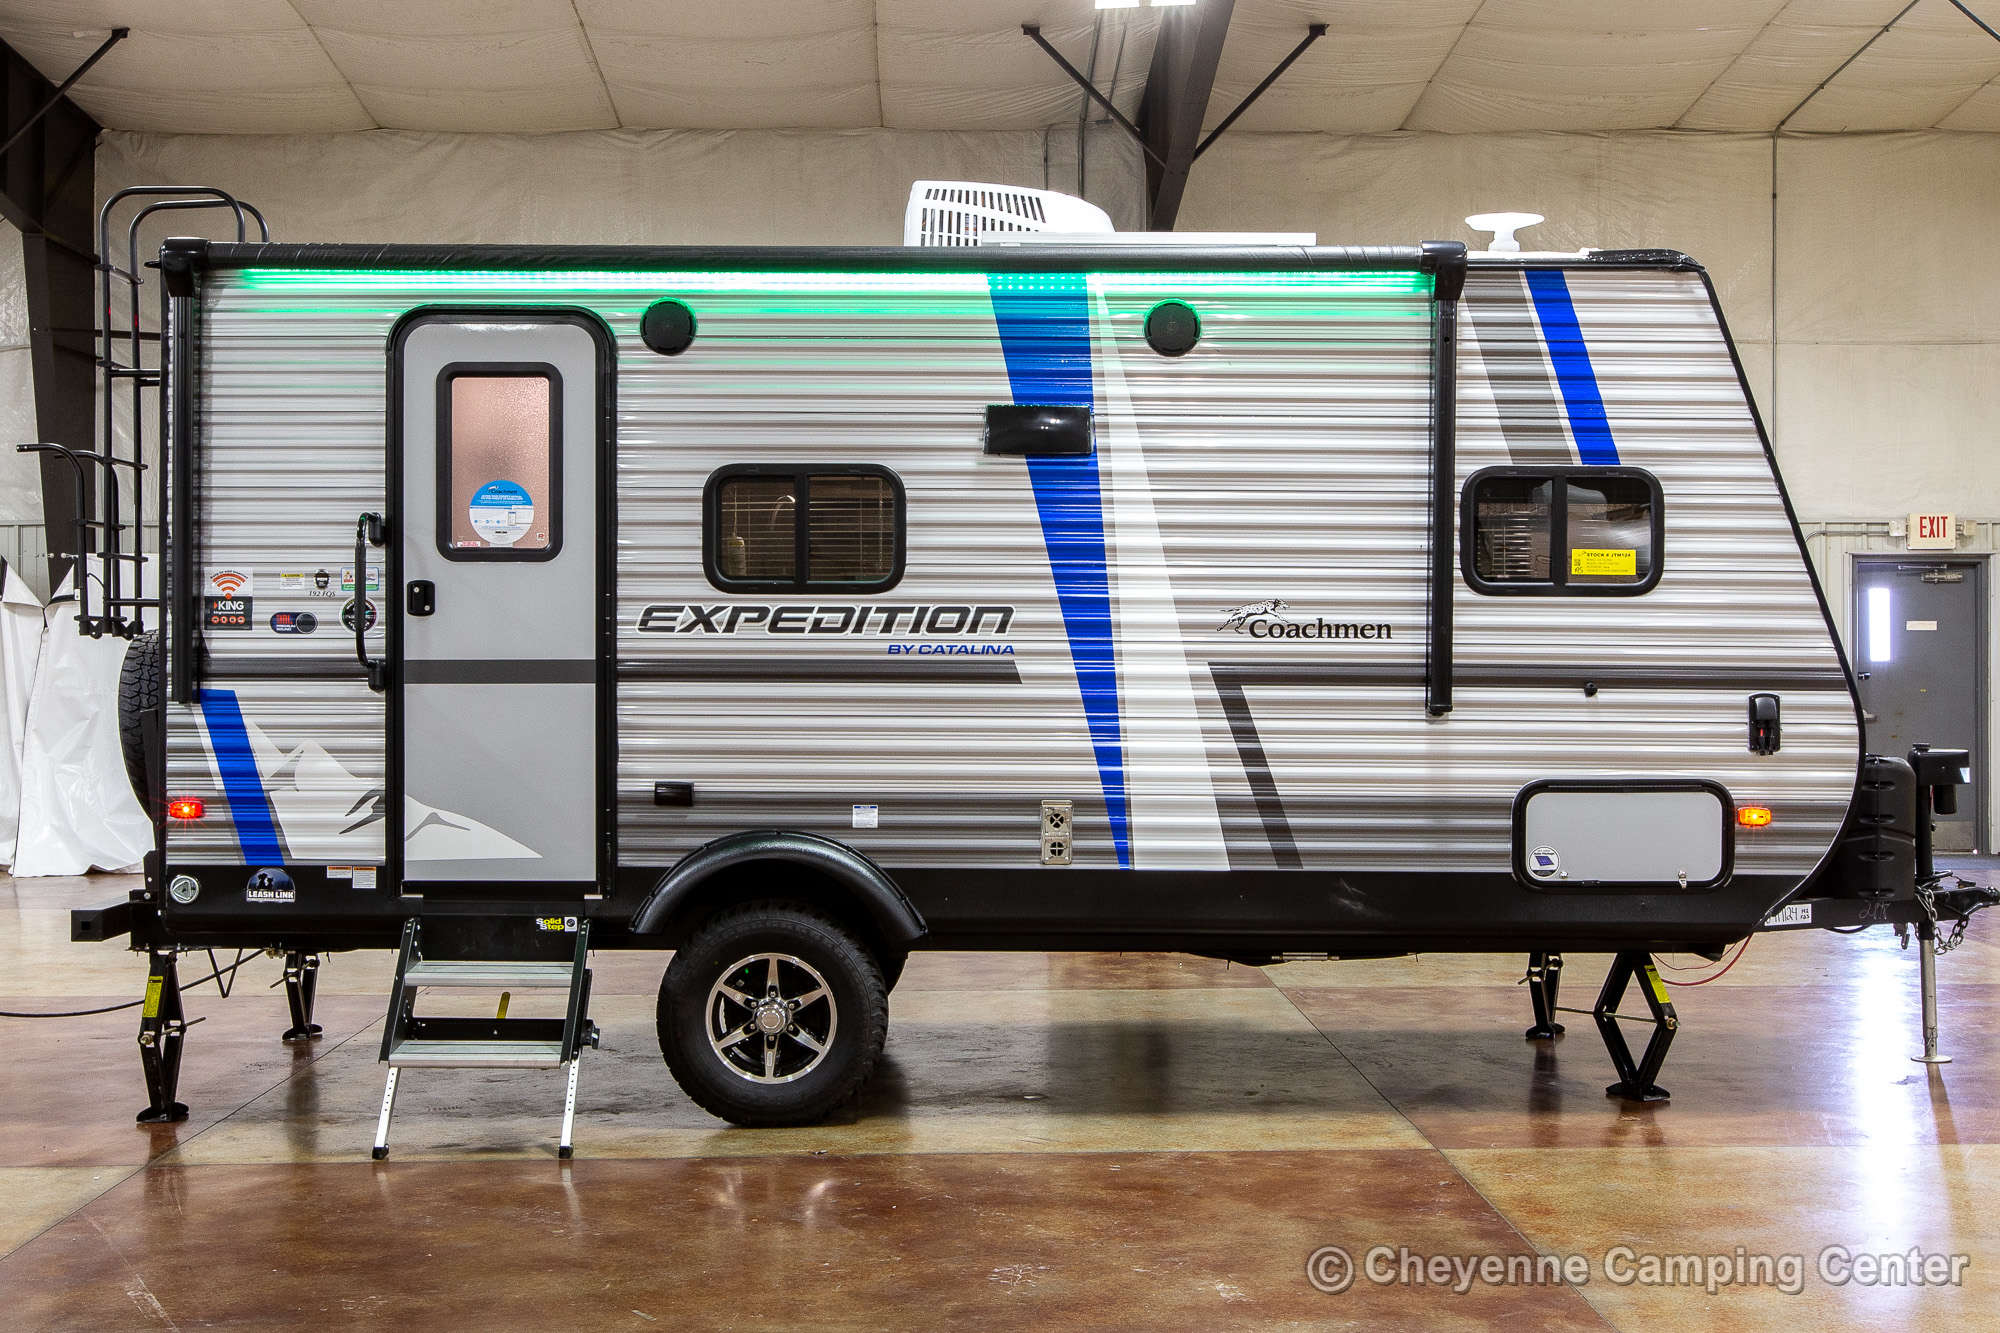 2022 Coachmen  Catalina Expedition 192FQS Travel Trailer Exterior Image